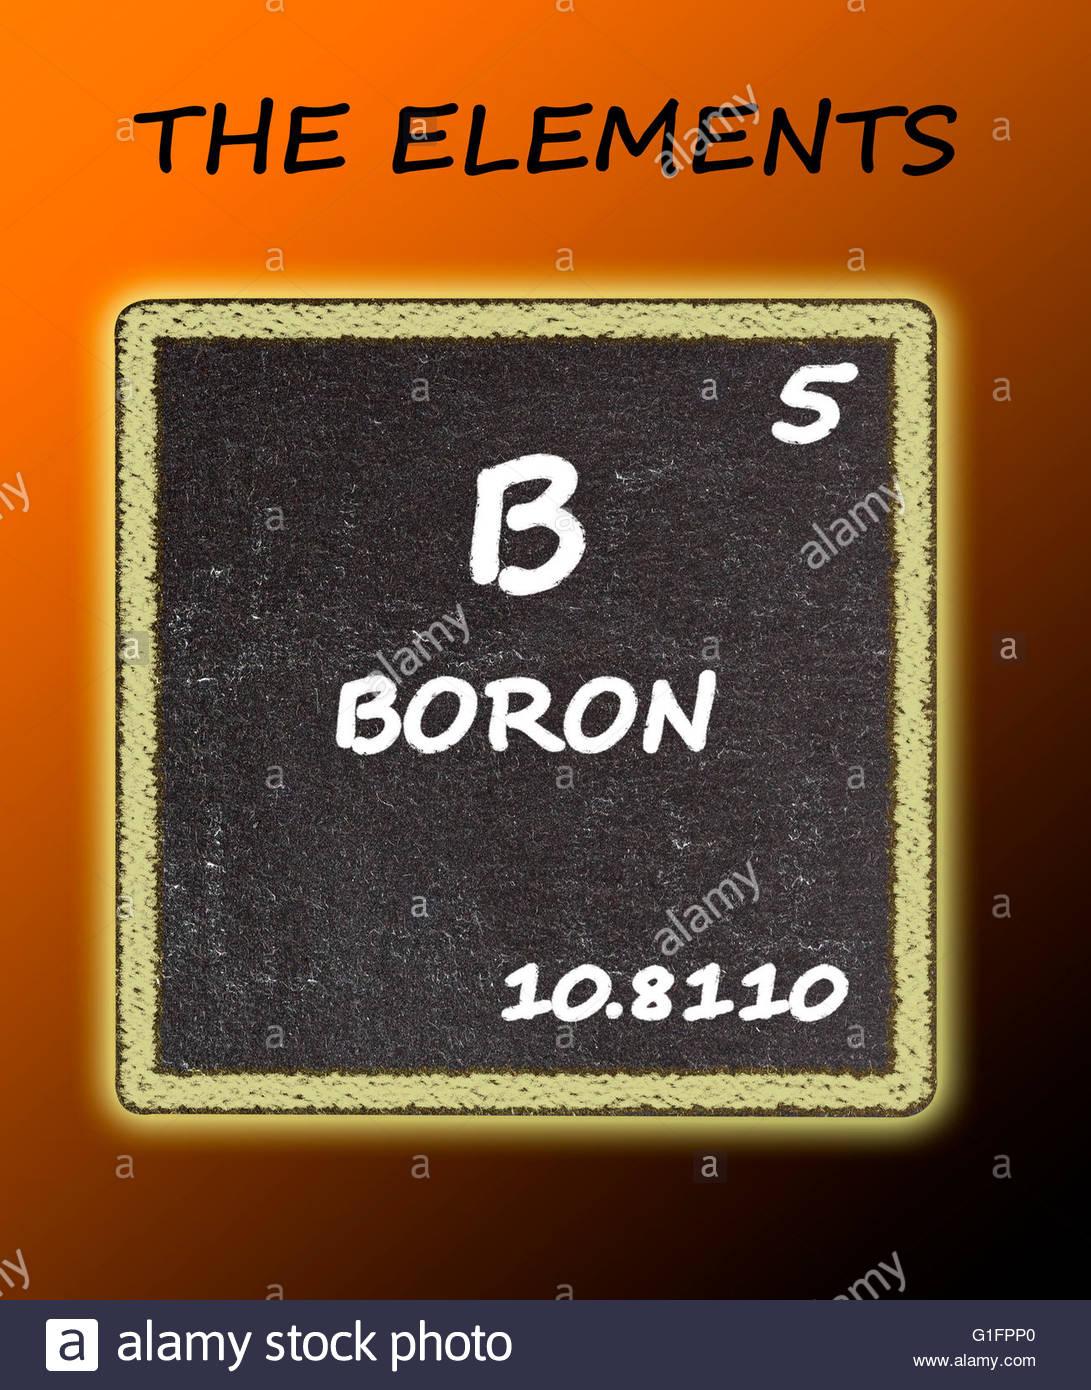 Boron Element Stock Photos Boron Element Stock Images Alamy